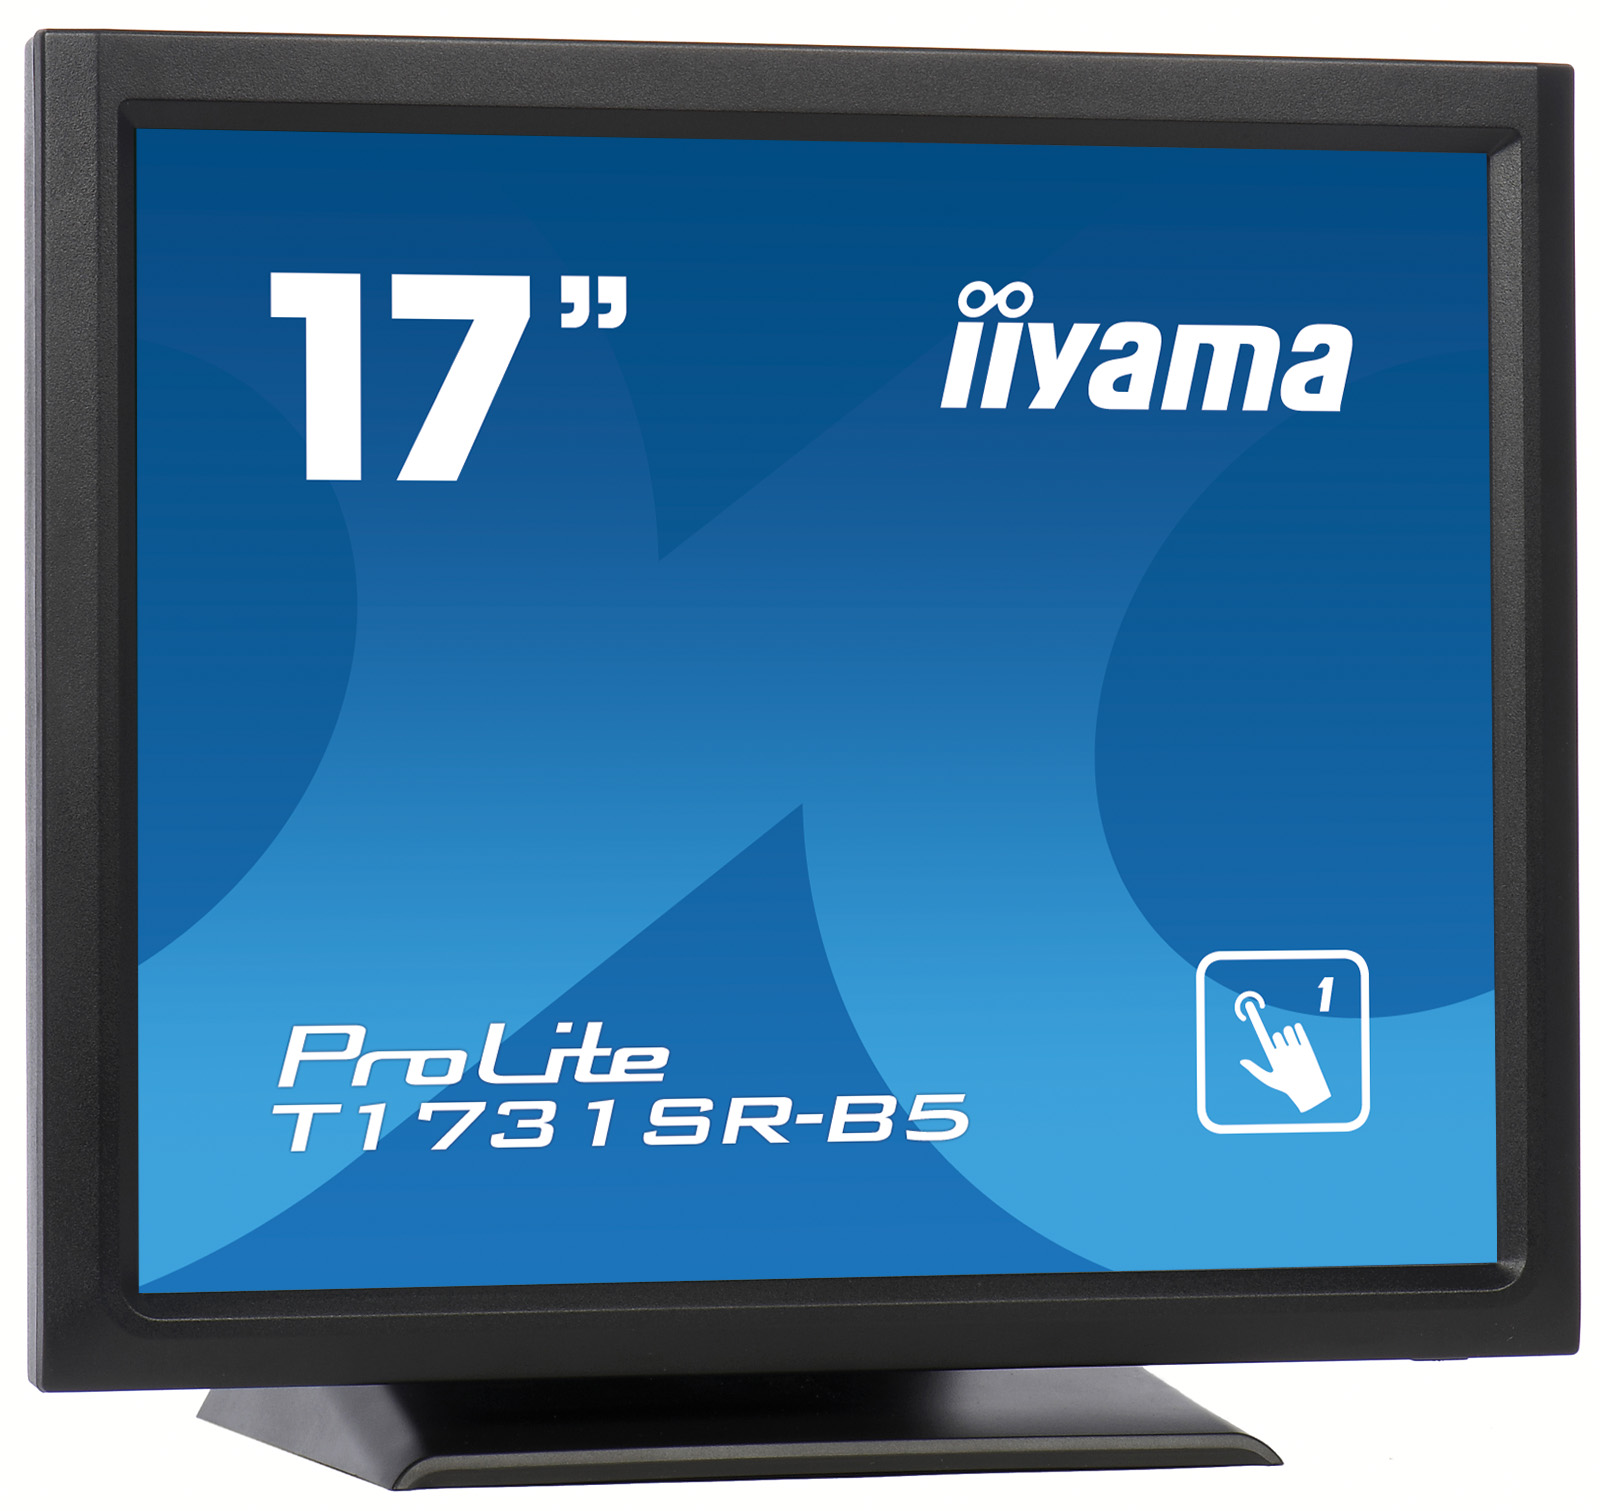 17'' iiyama T1731SR-B5 - TN,SXGA,5ms,250cd/m2, 1000:1,5:4,VGA,HDMI,DP,USB,repro.